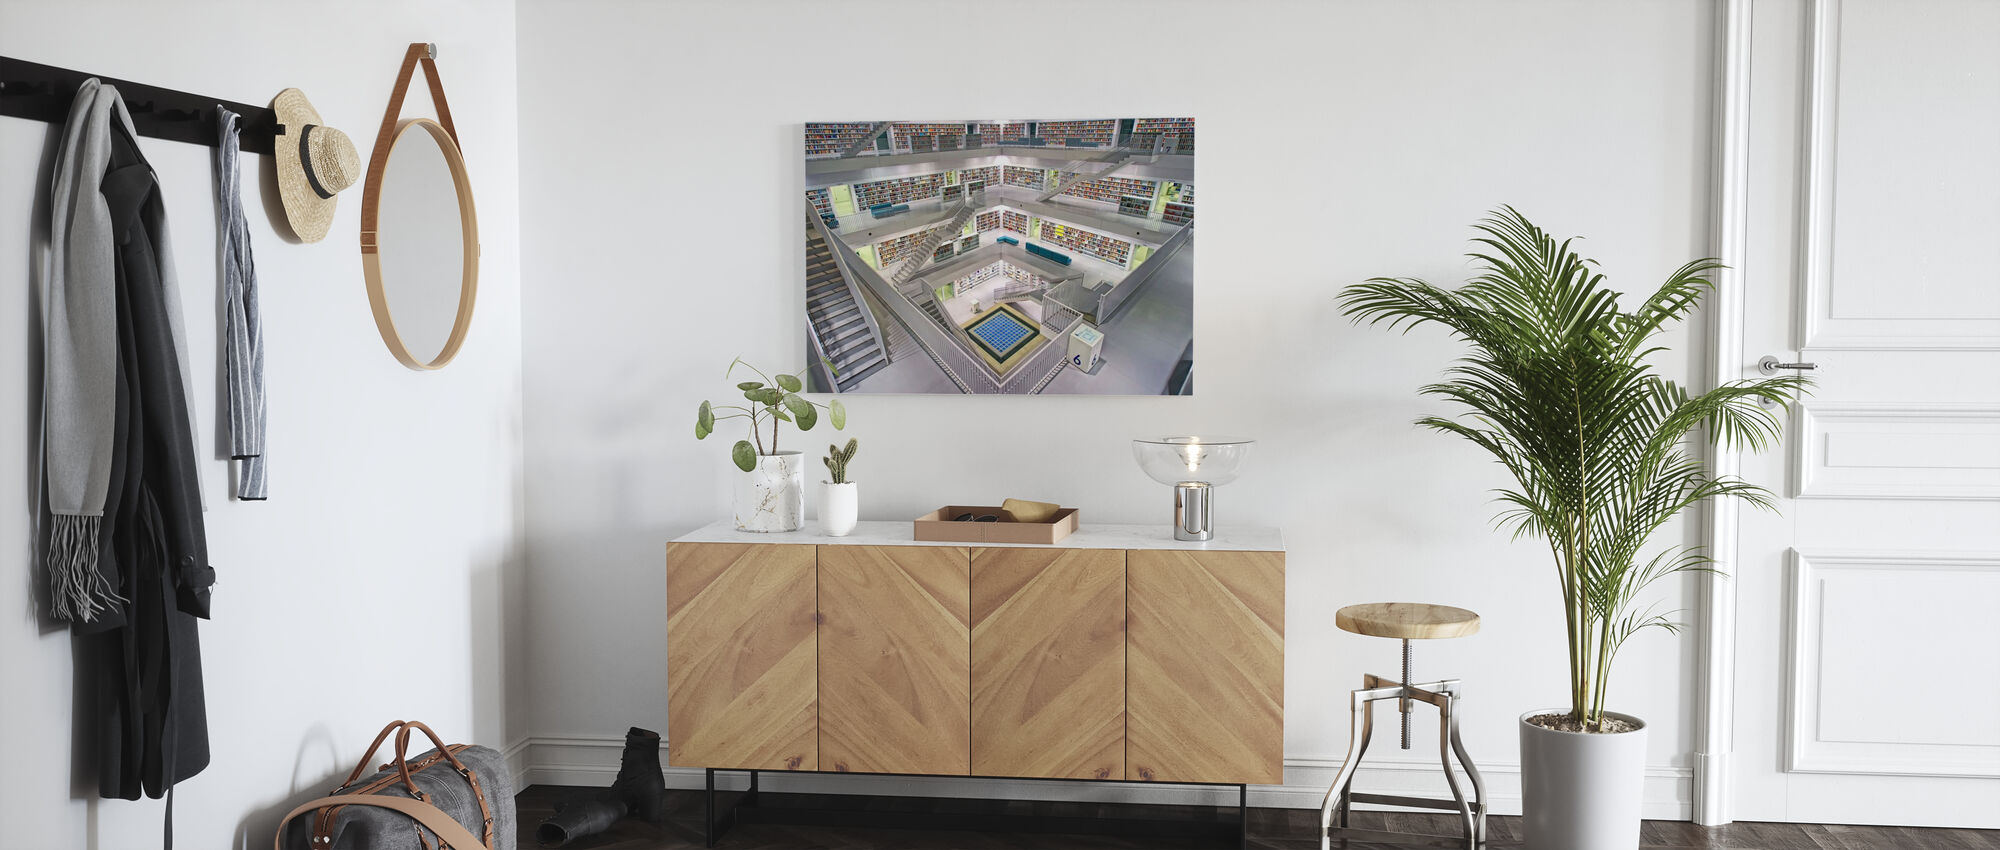 Moderni kaupunginkirjasto - Canvastaulu - Aula